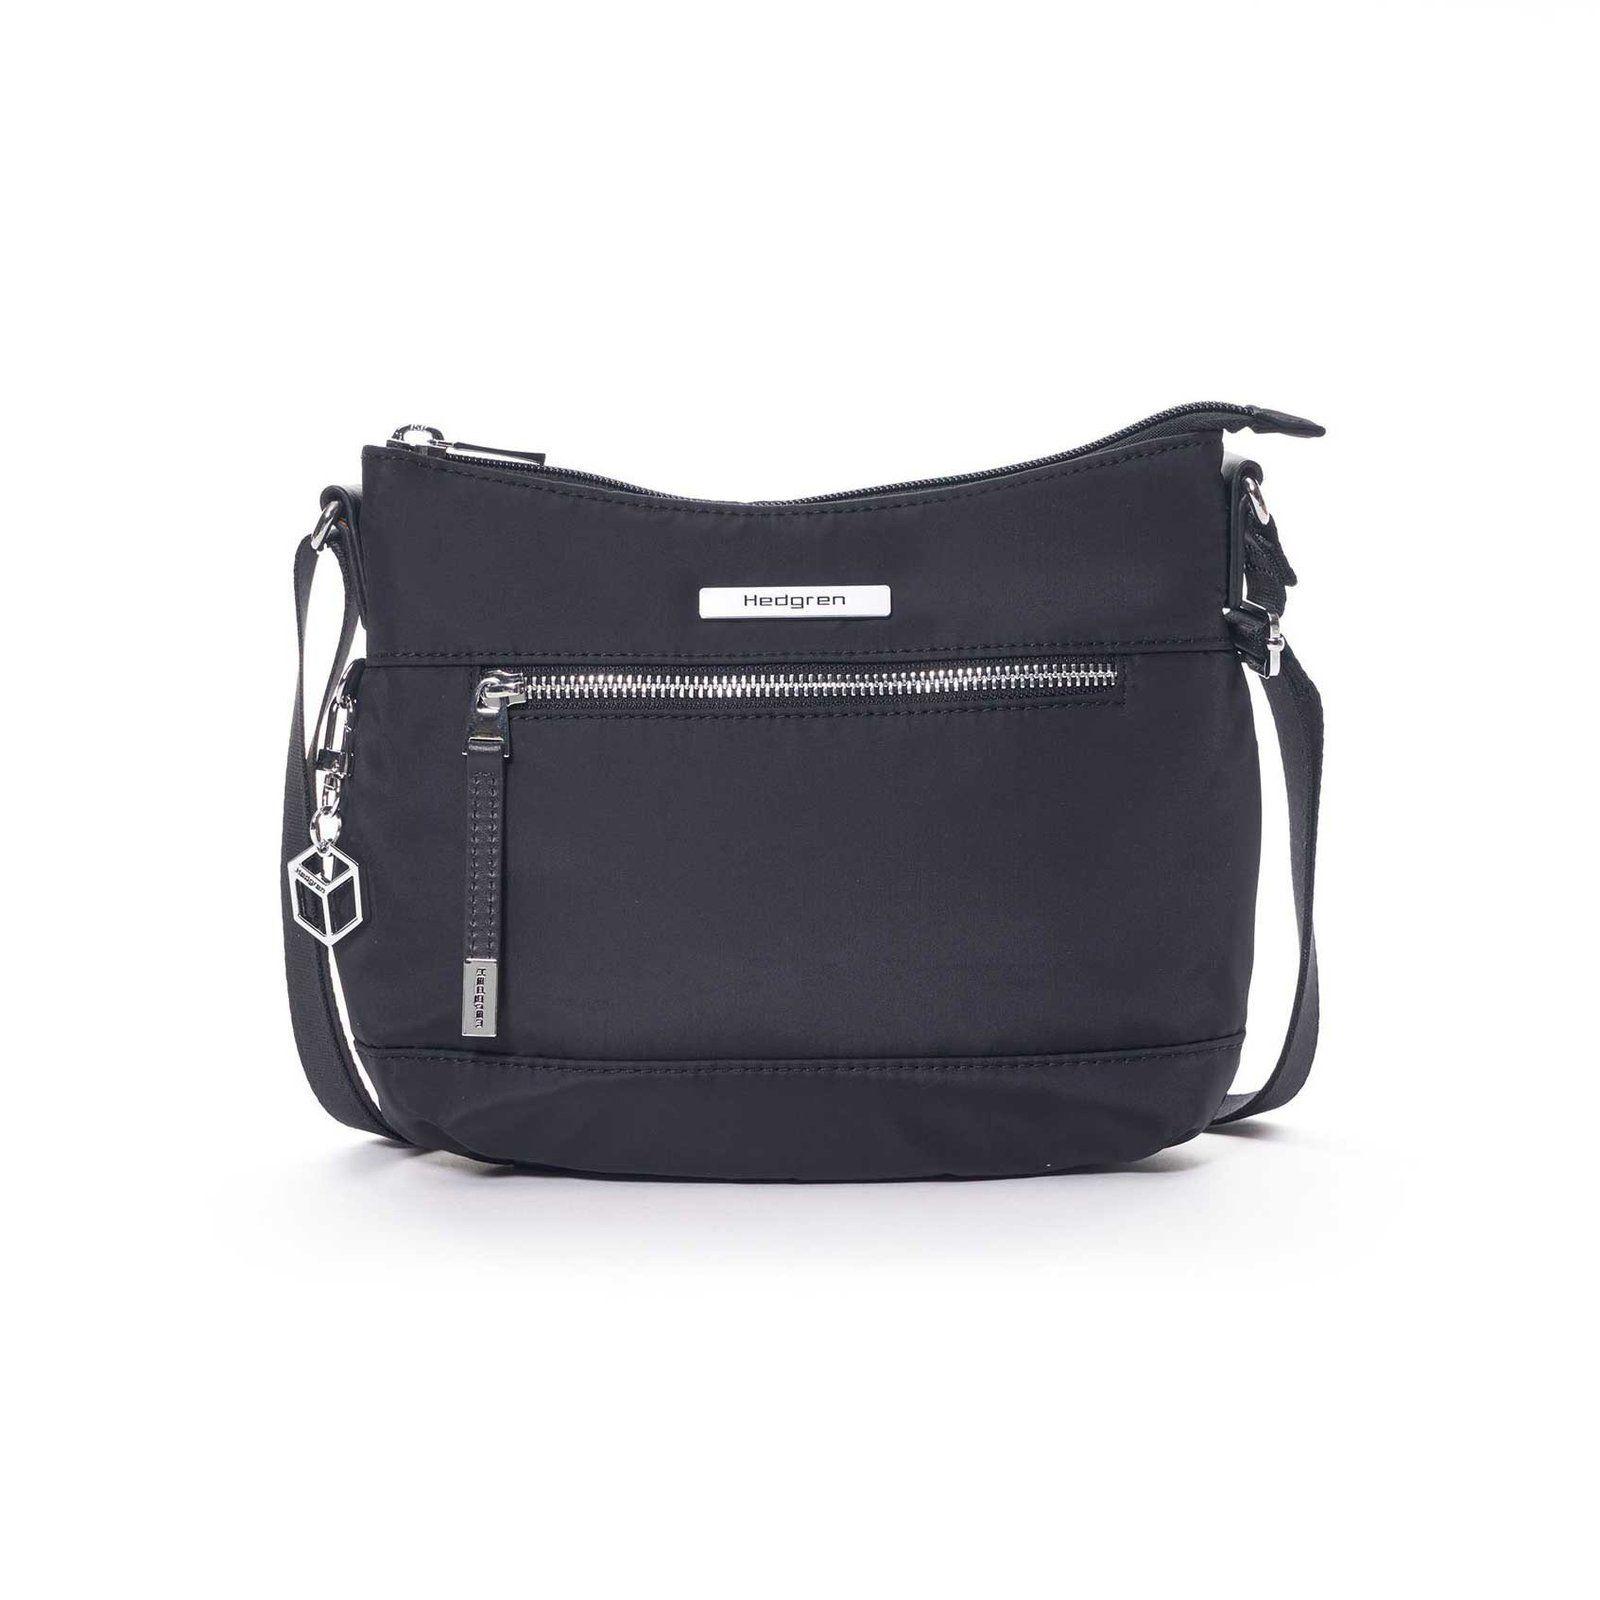 3f9bbefa84b66 Women s Gleam S Crossover Bag